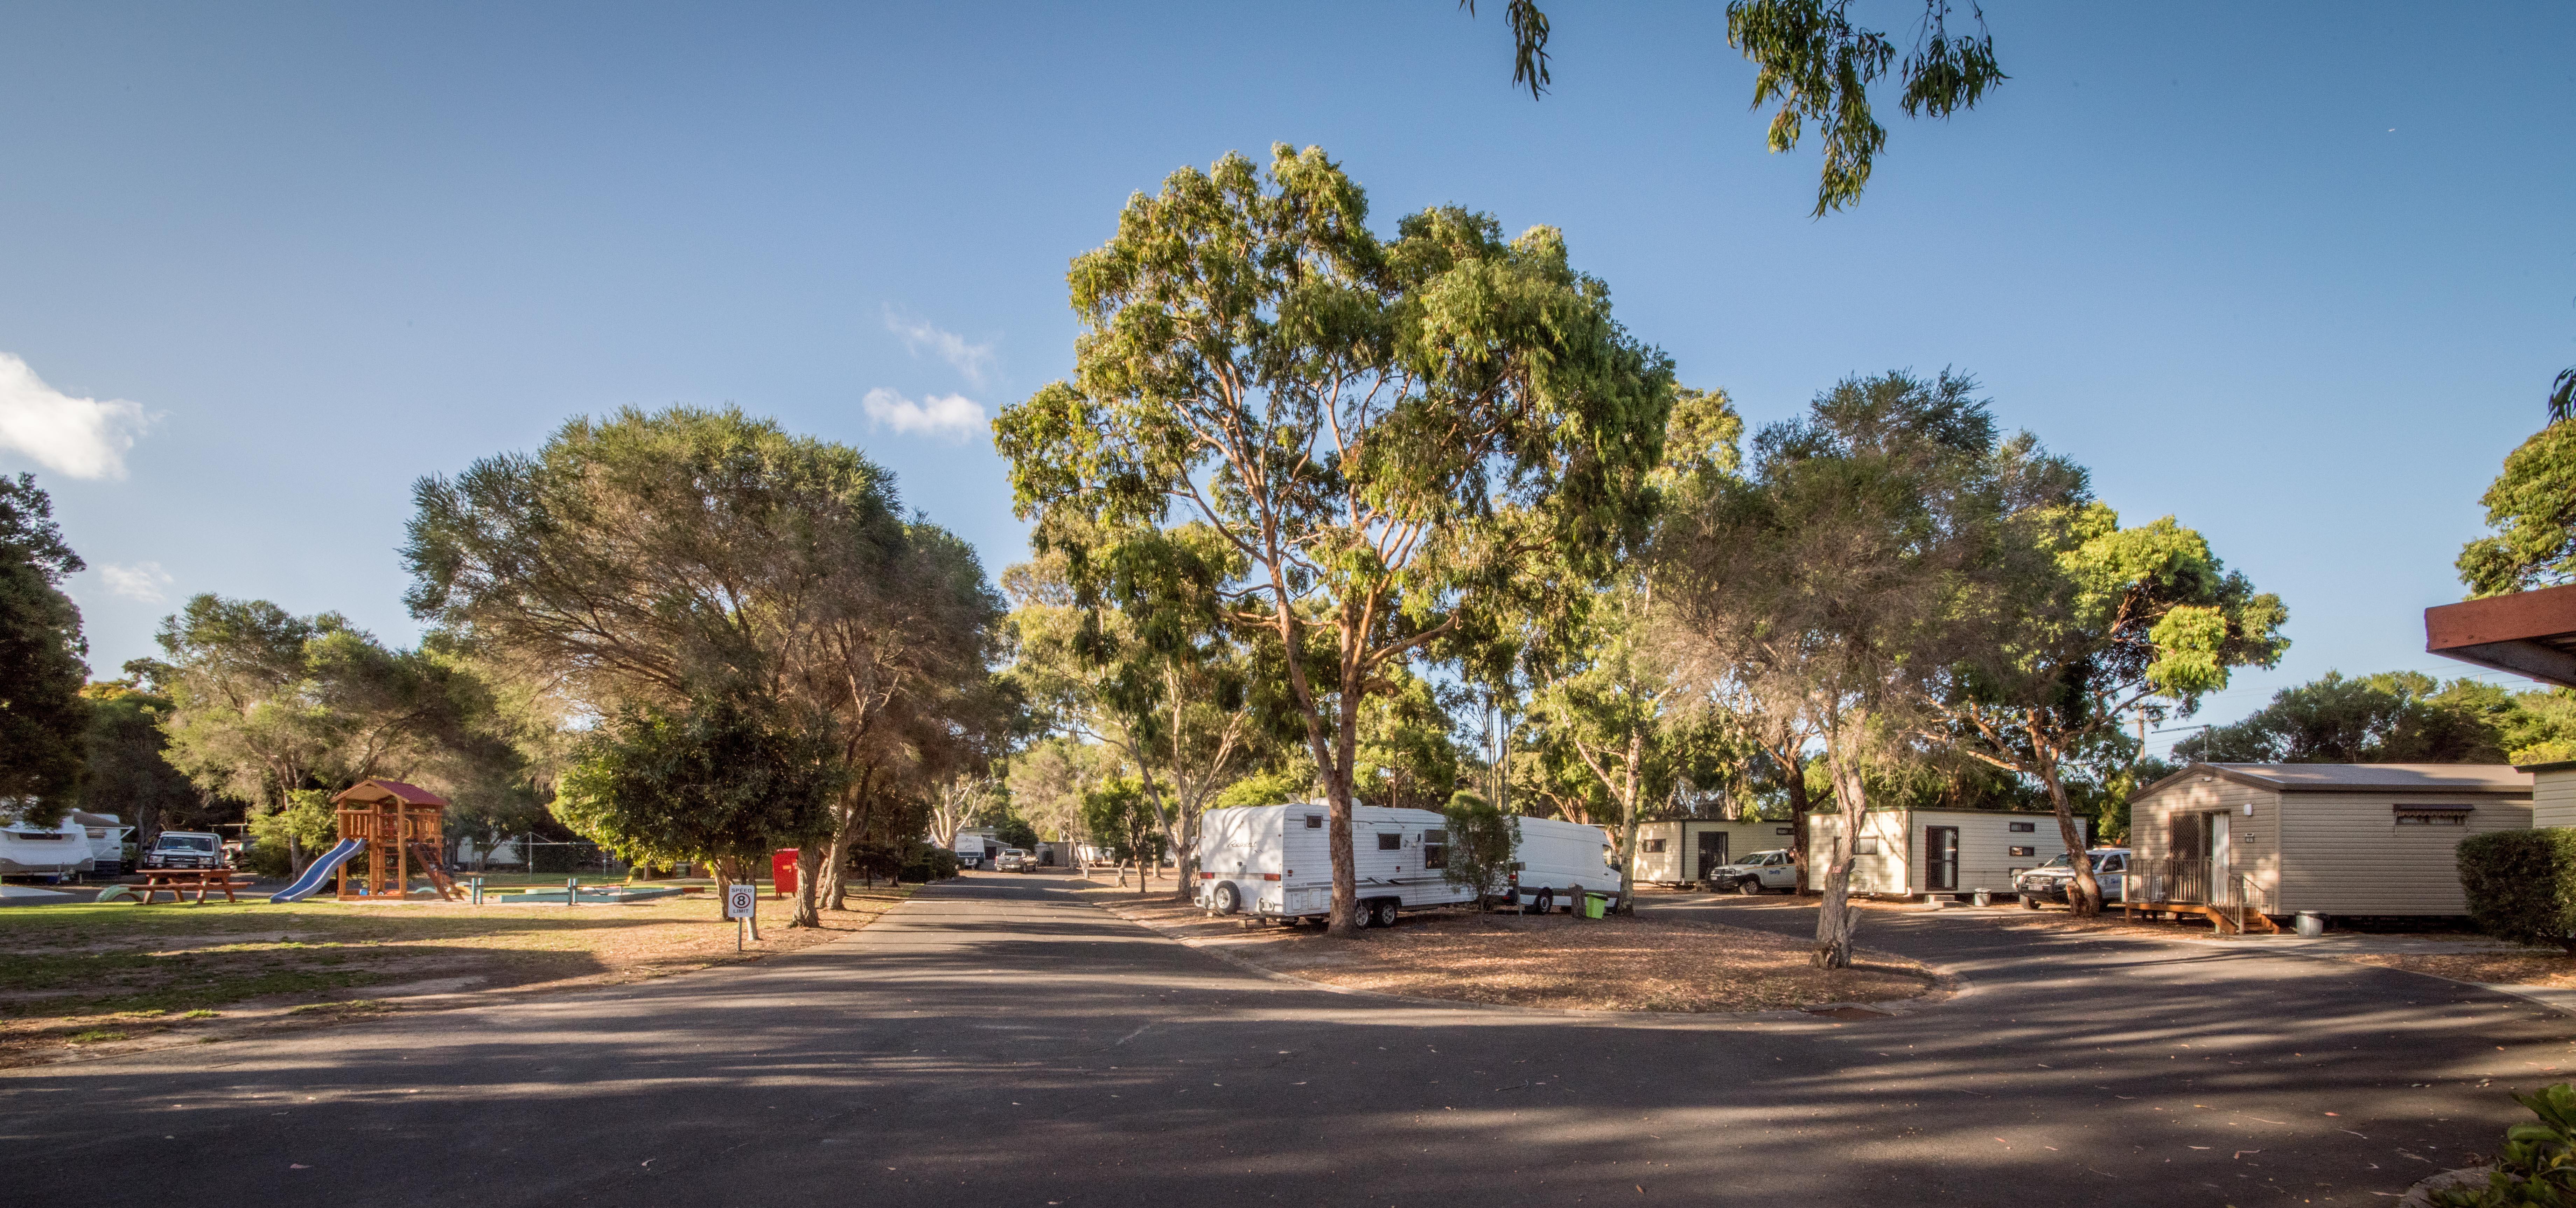 caravan park sites and cabins